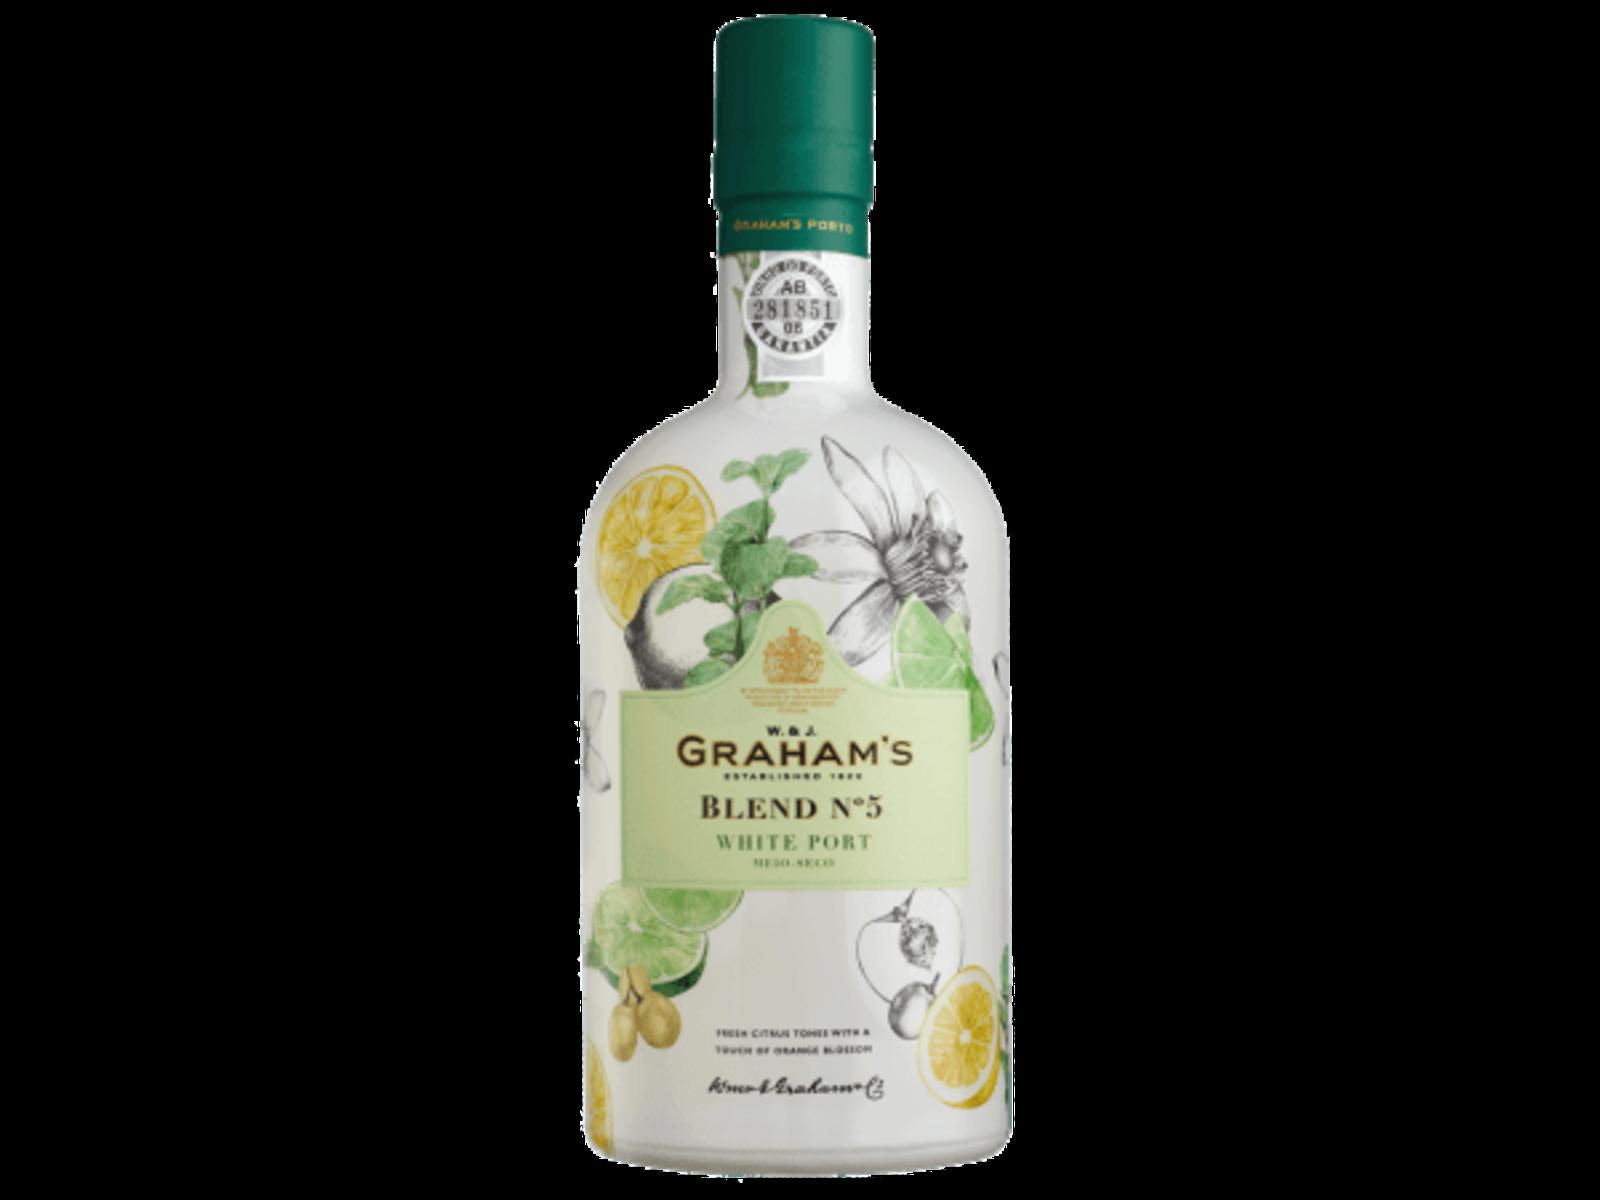 Graham's Port Graham's / White Port / Blend No 5